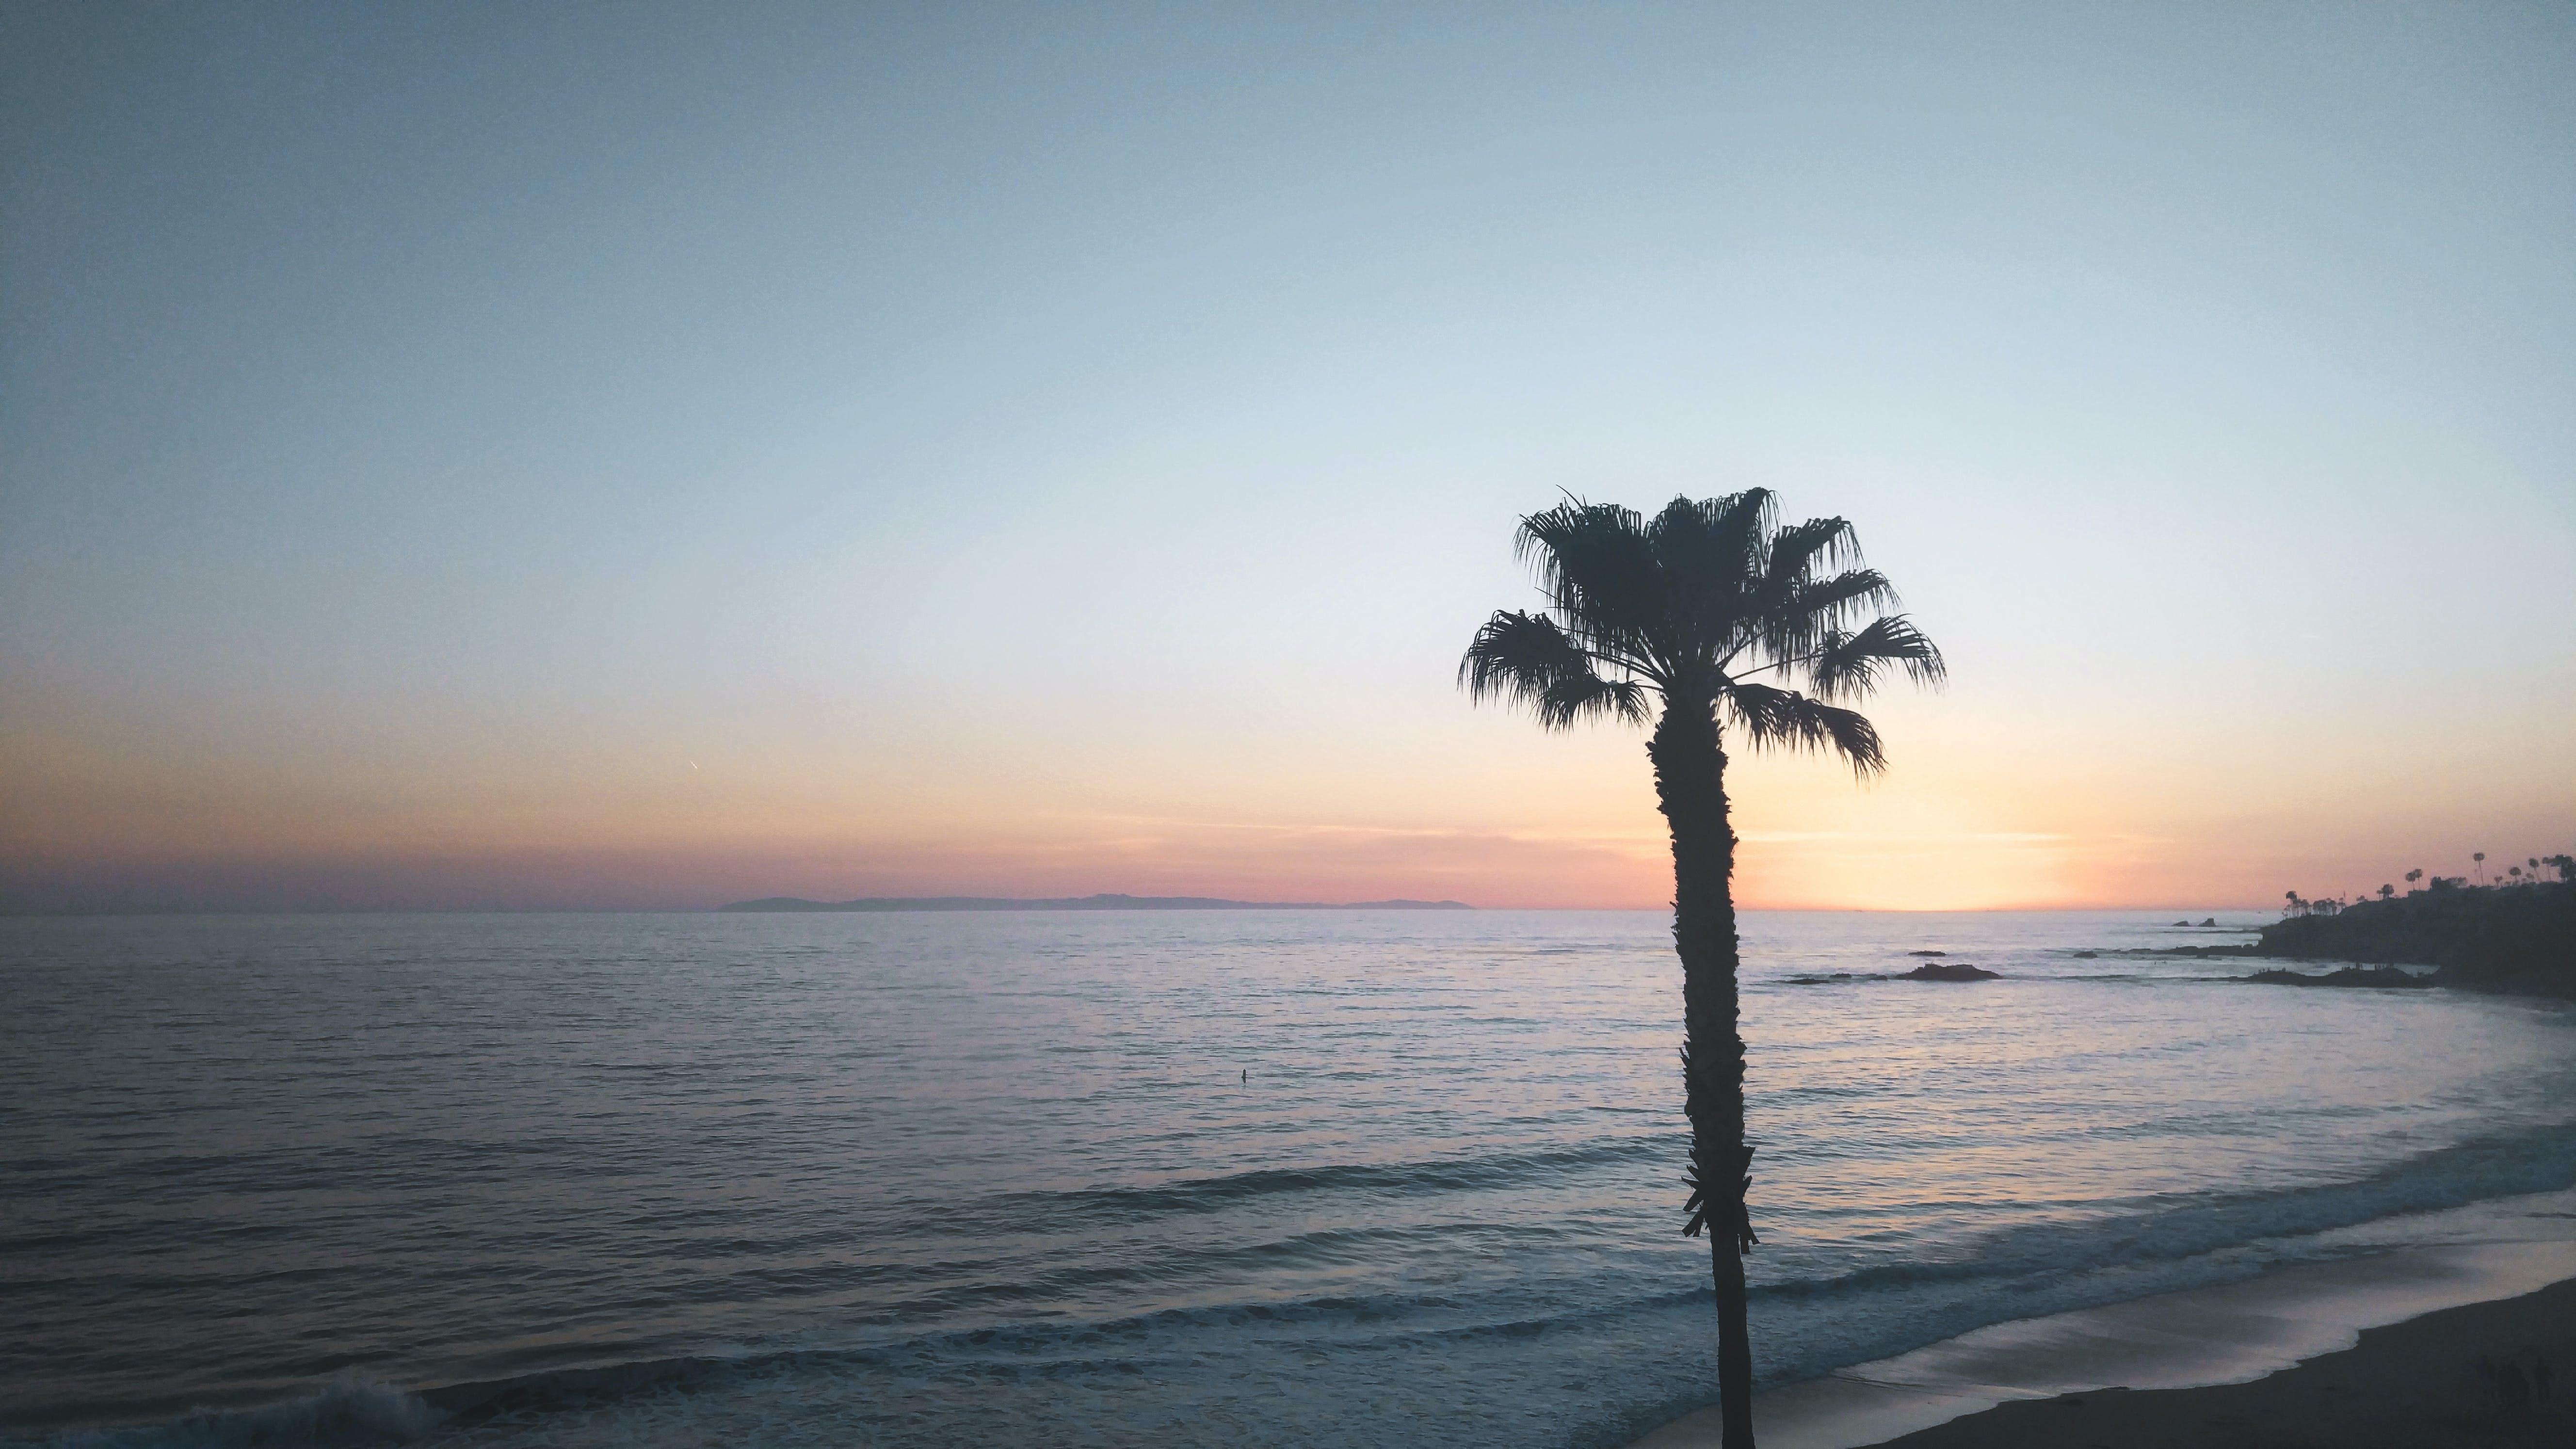 Free stock photo of beach, ocean, palm tree, sunset